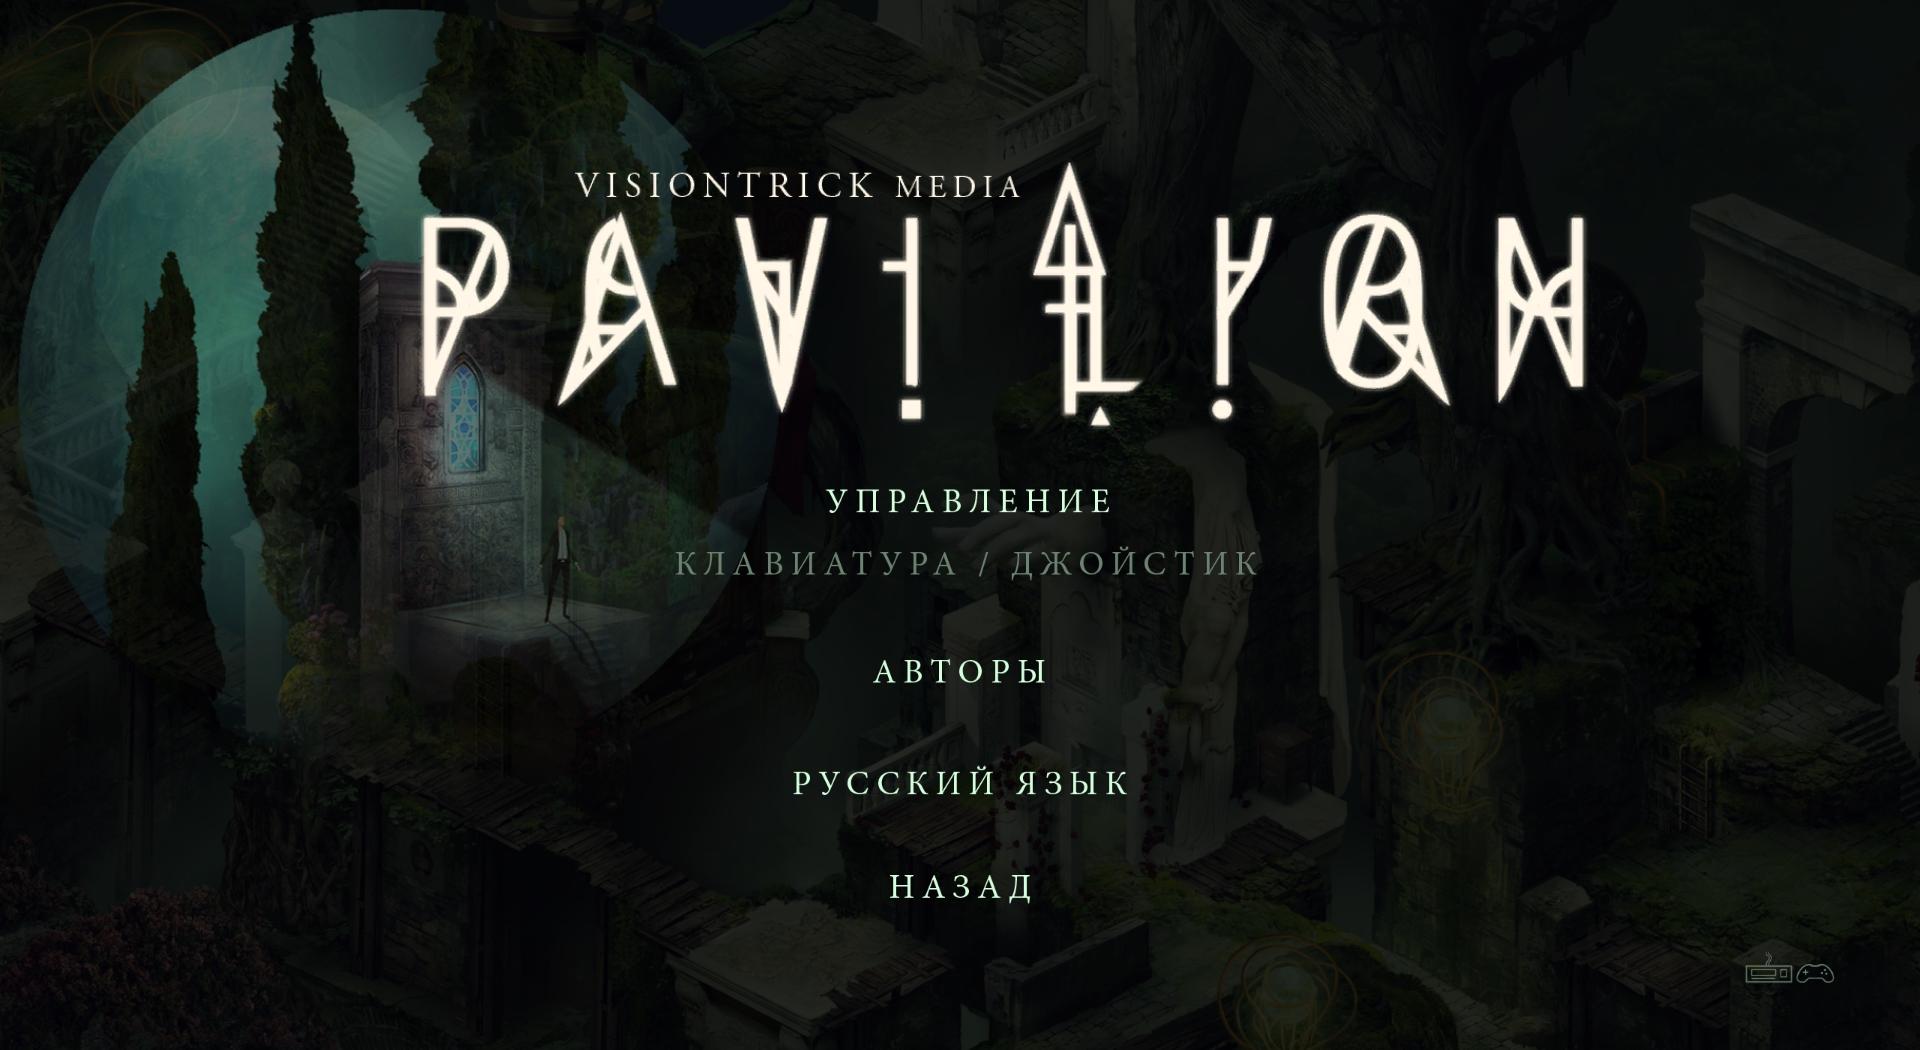 Options menu in Russian